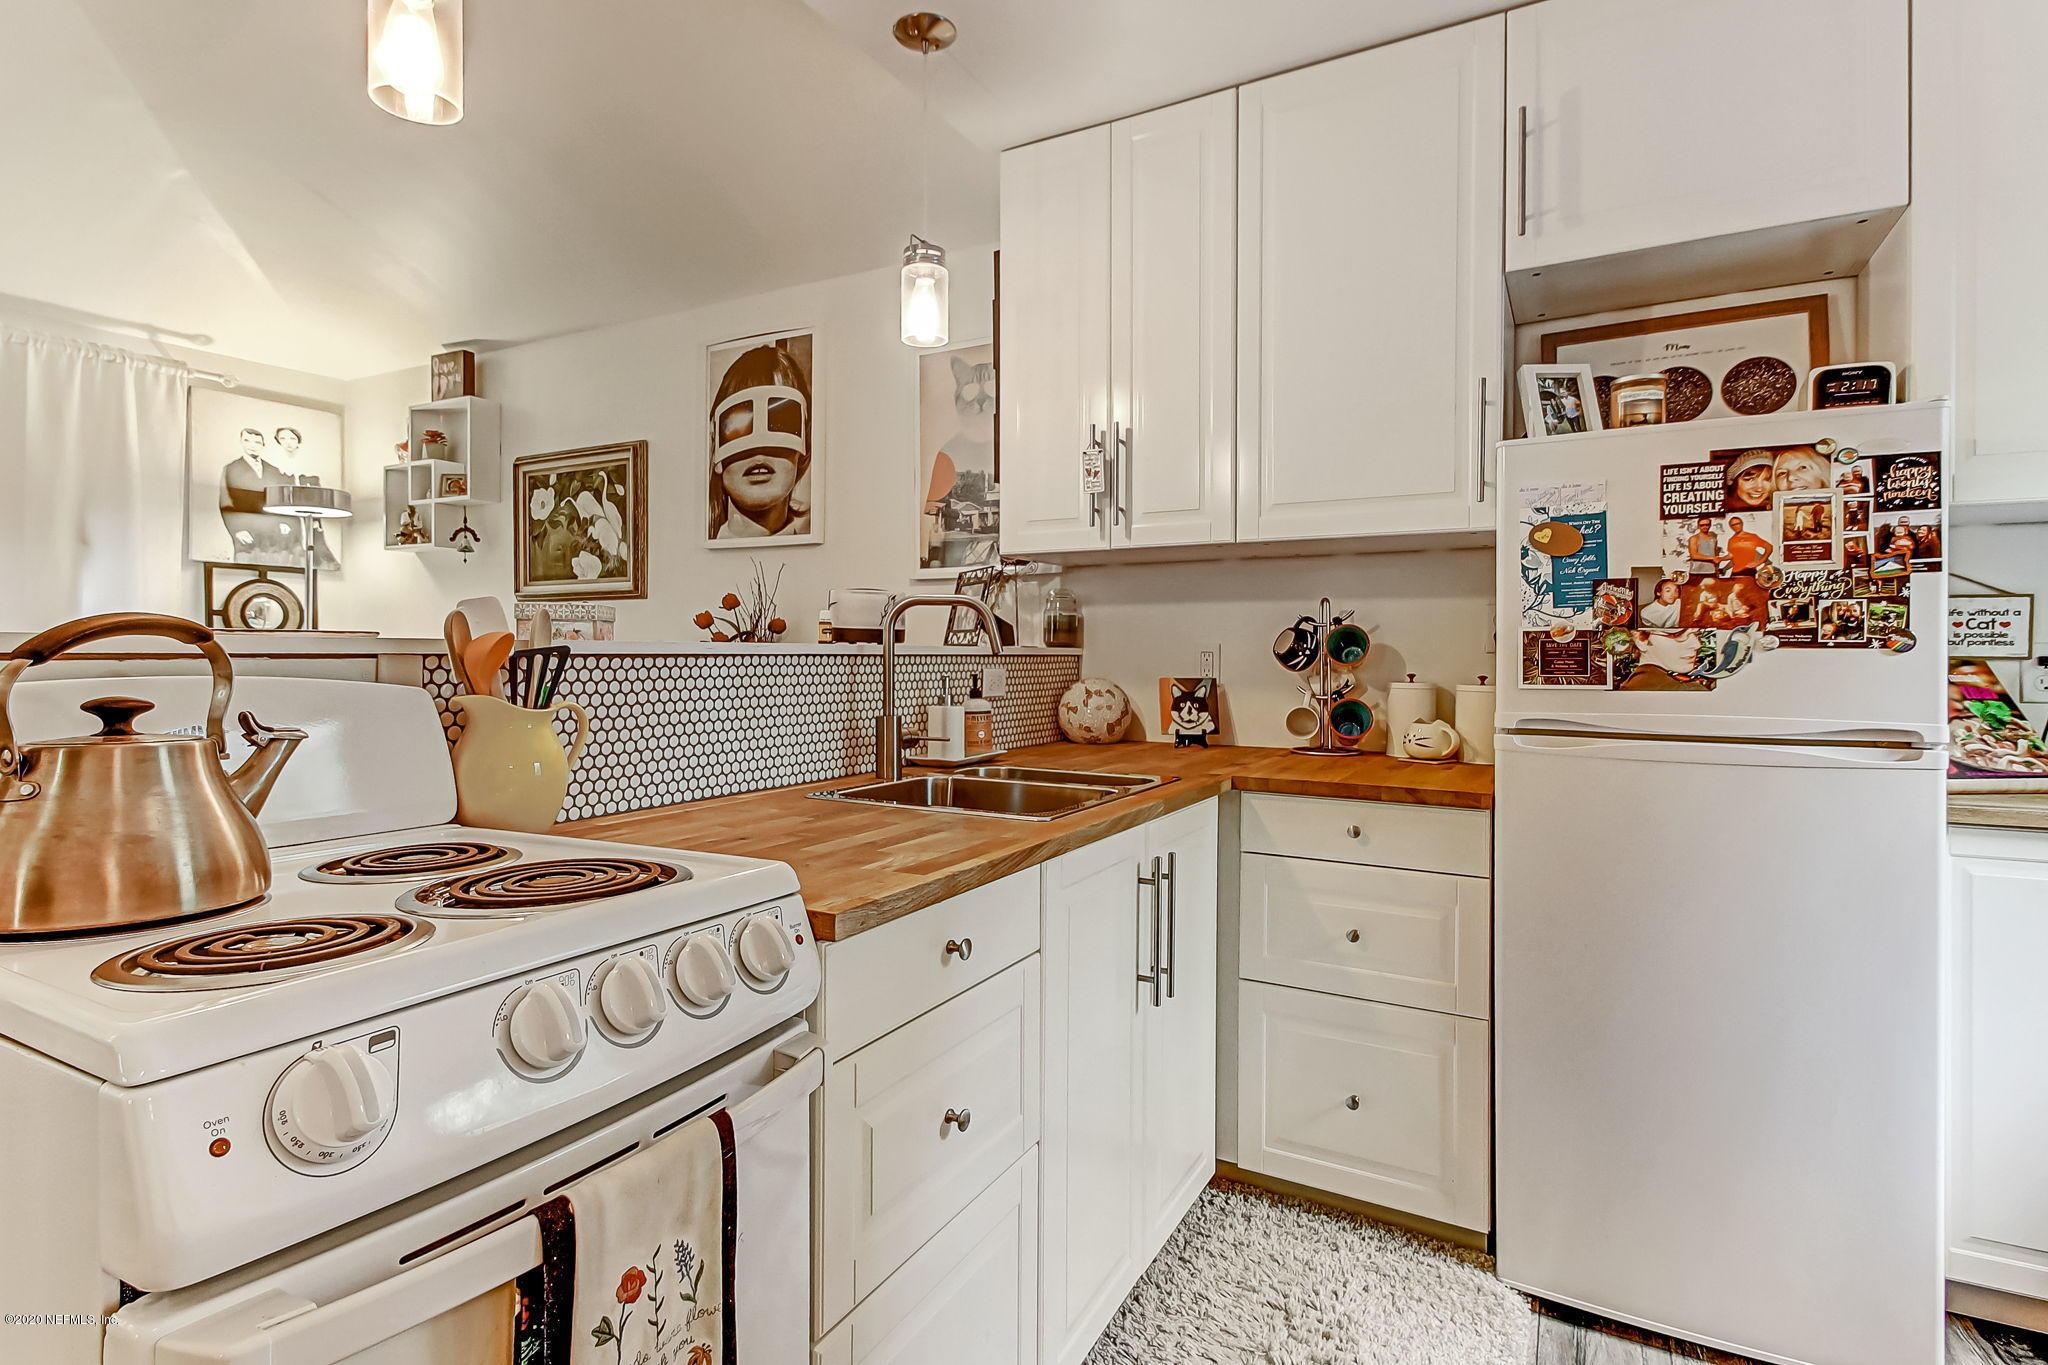 2263 ST JOHNS, JACKSONVILLE, FLORIDA 32204, ,Commercial,For sale,ST JOHNS,1053297